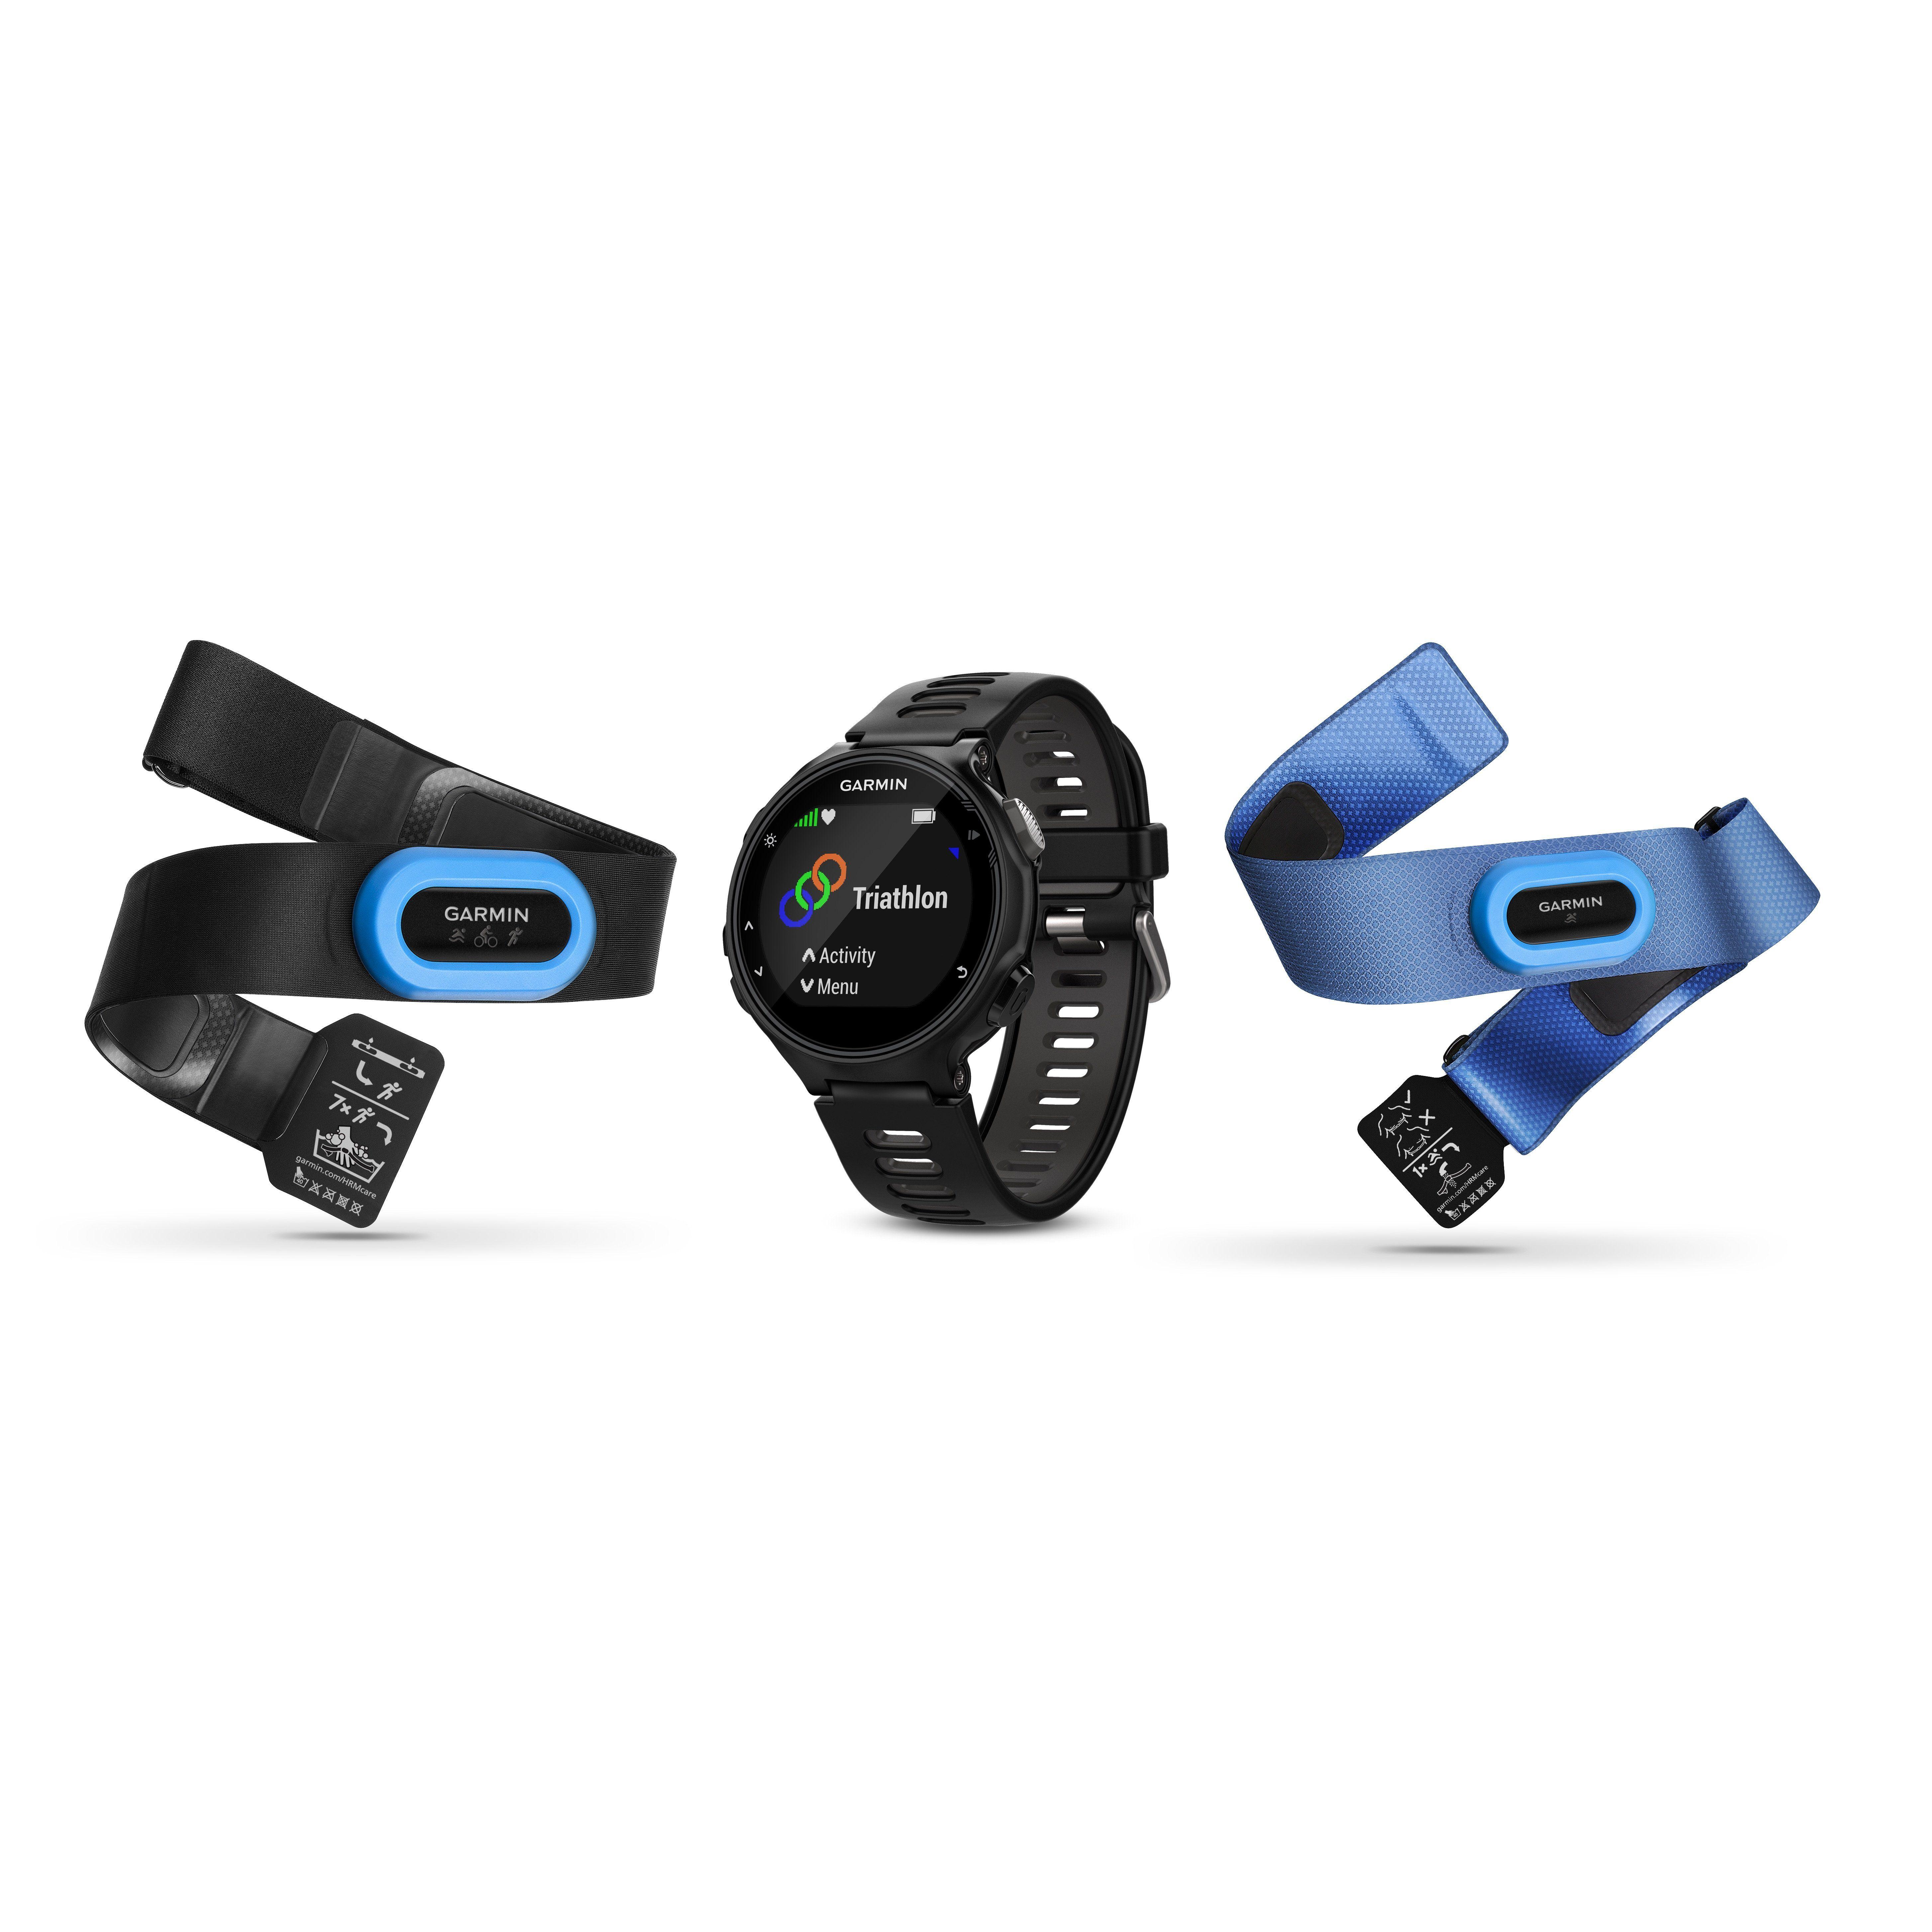 GARMIN Forerunner 735XT GPS Running Multi-Sport Watch Tri Bundle